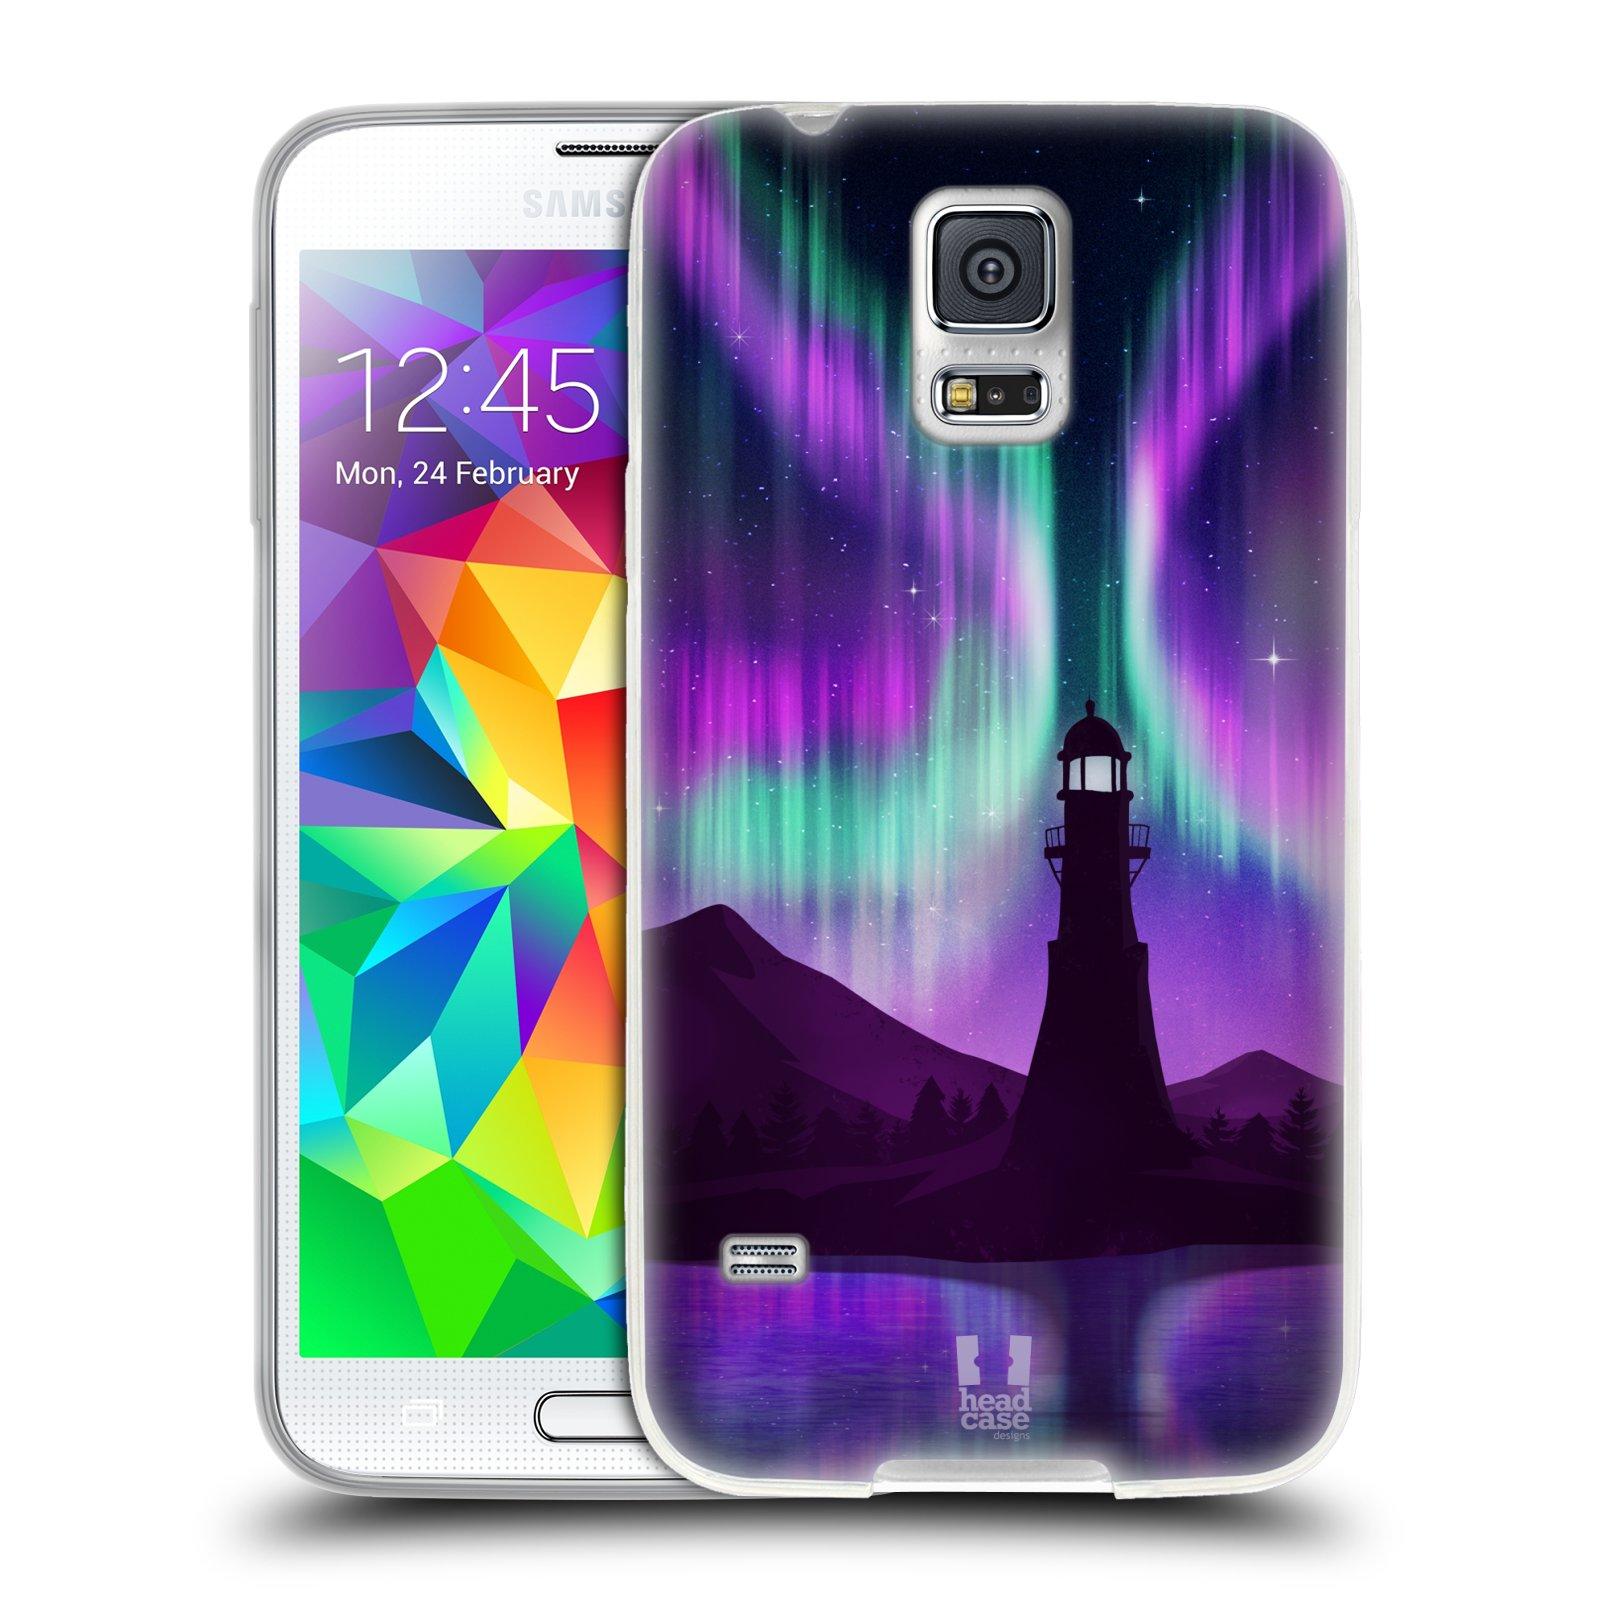 Silikonové pouzdro na mobil Samsung Galaxy S5 HEAD CASE Polární Záře Maják (Silikonový kryt či obal na mobilní telefon Samsung Galaxy S5 SM-G900F)